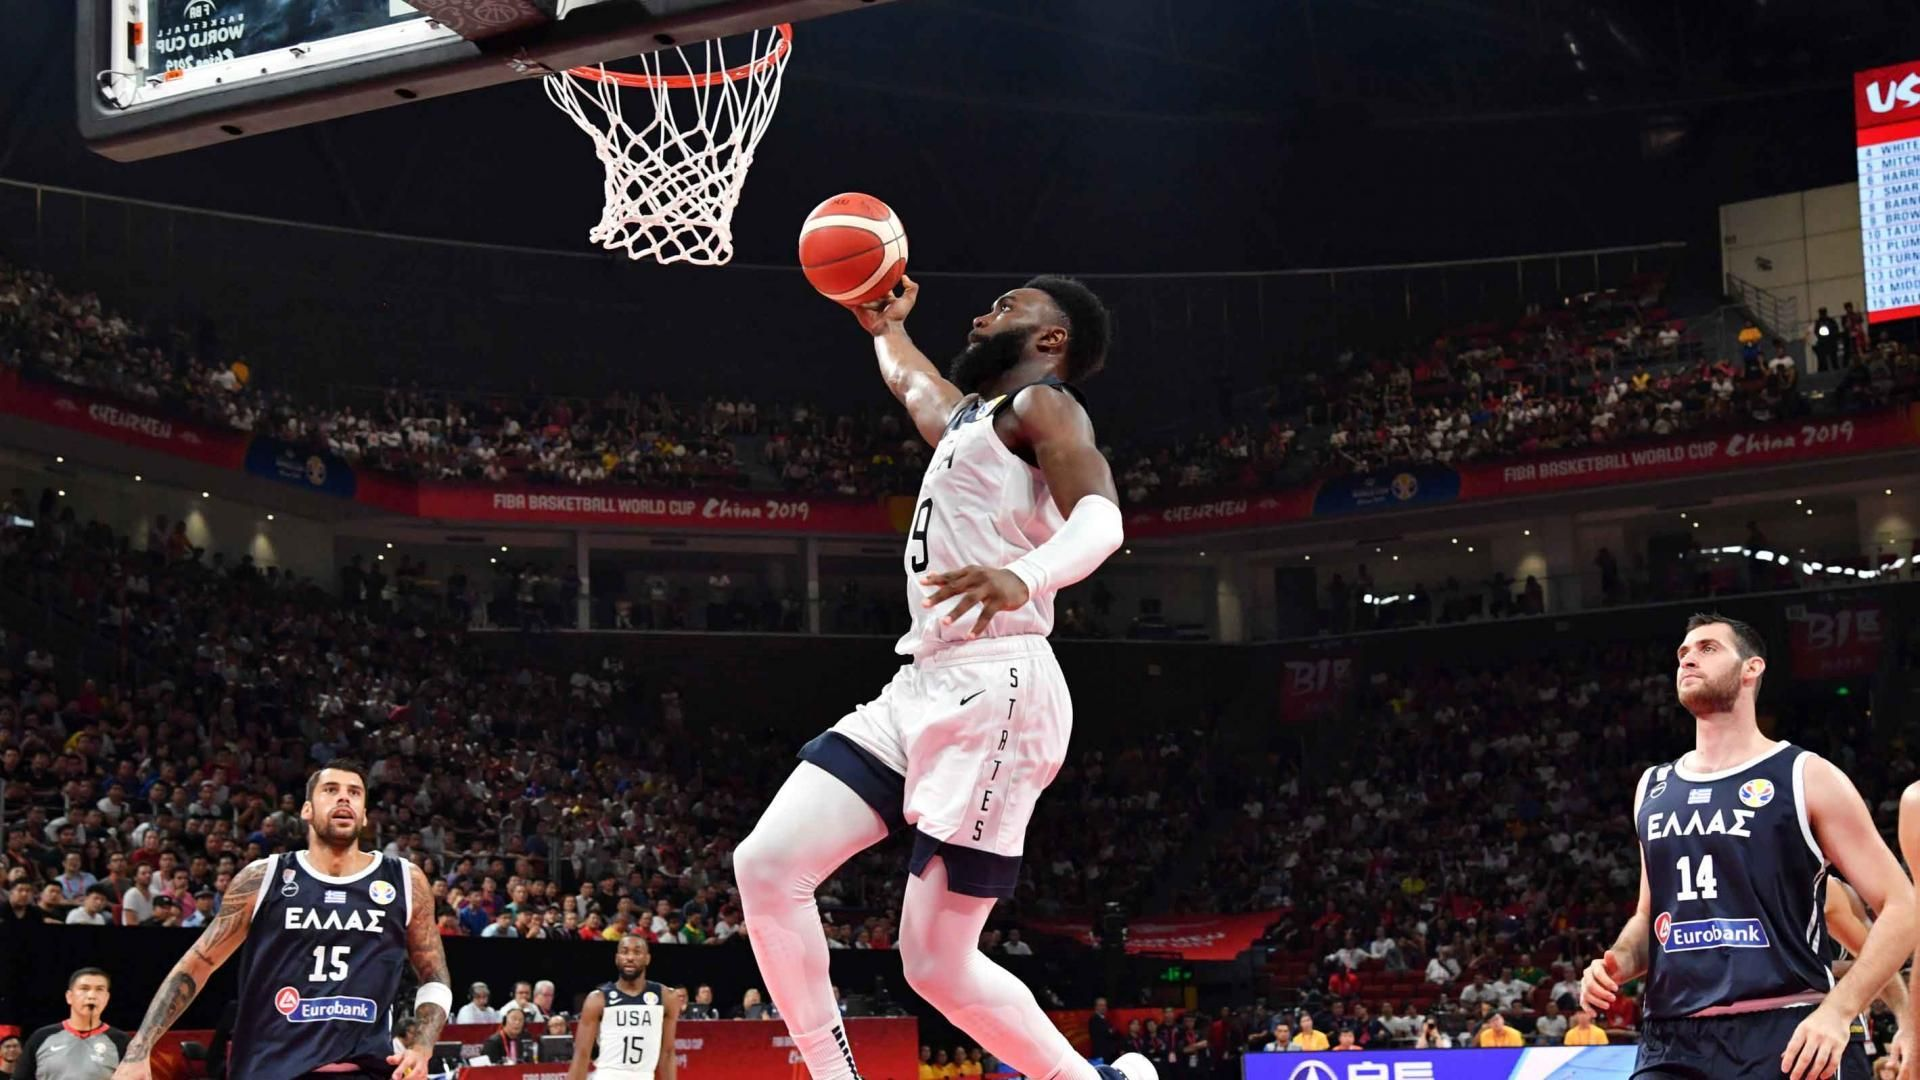 Basketball world cup USA v France QUARTERFINAL! LIVE